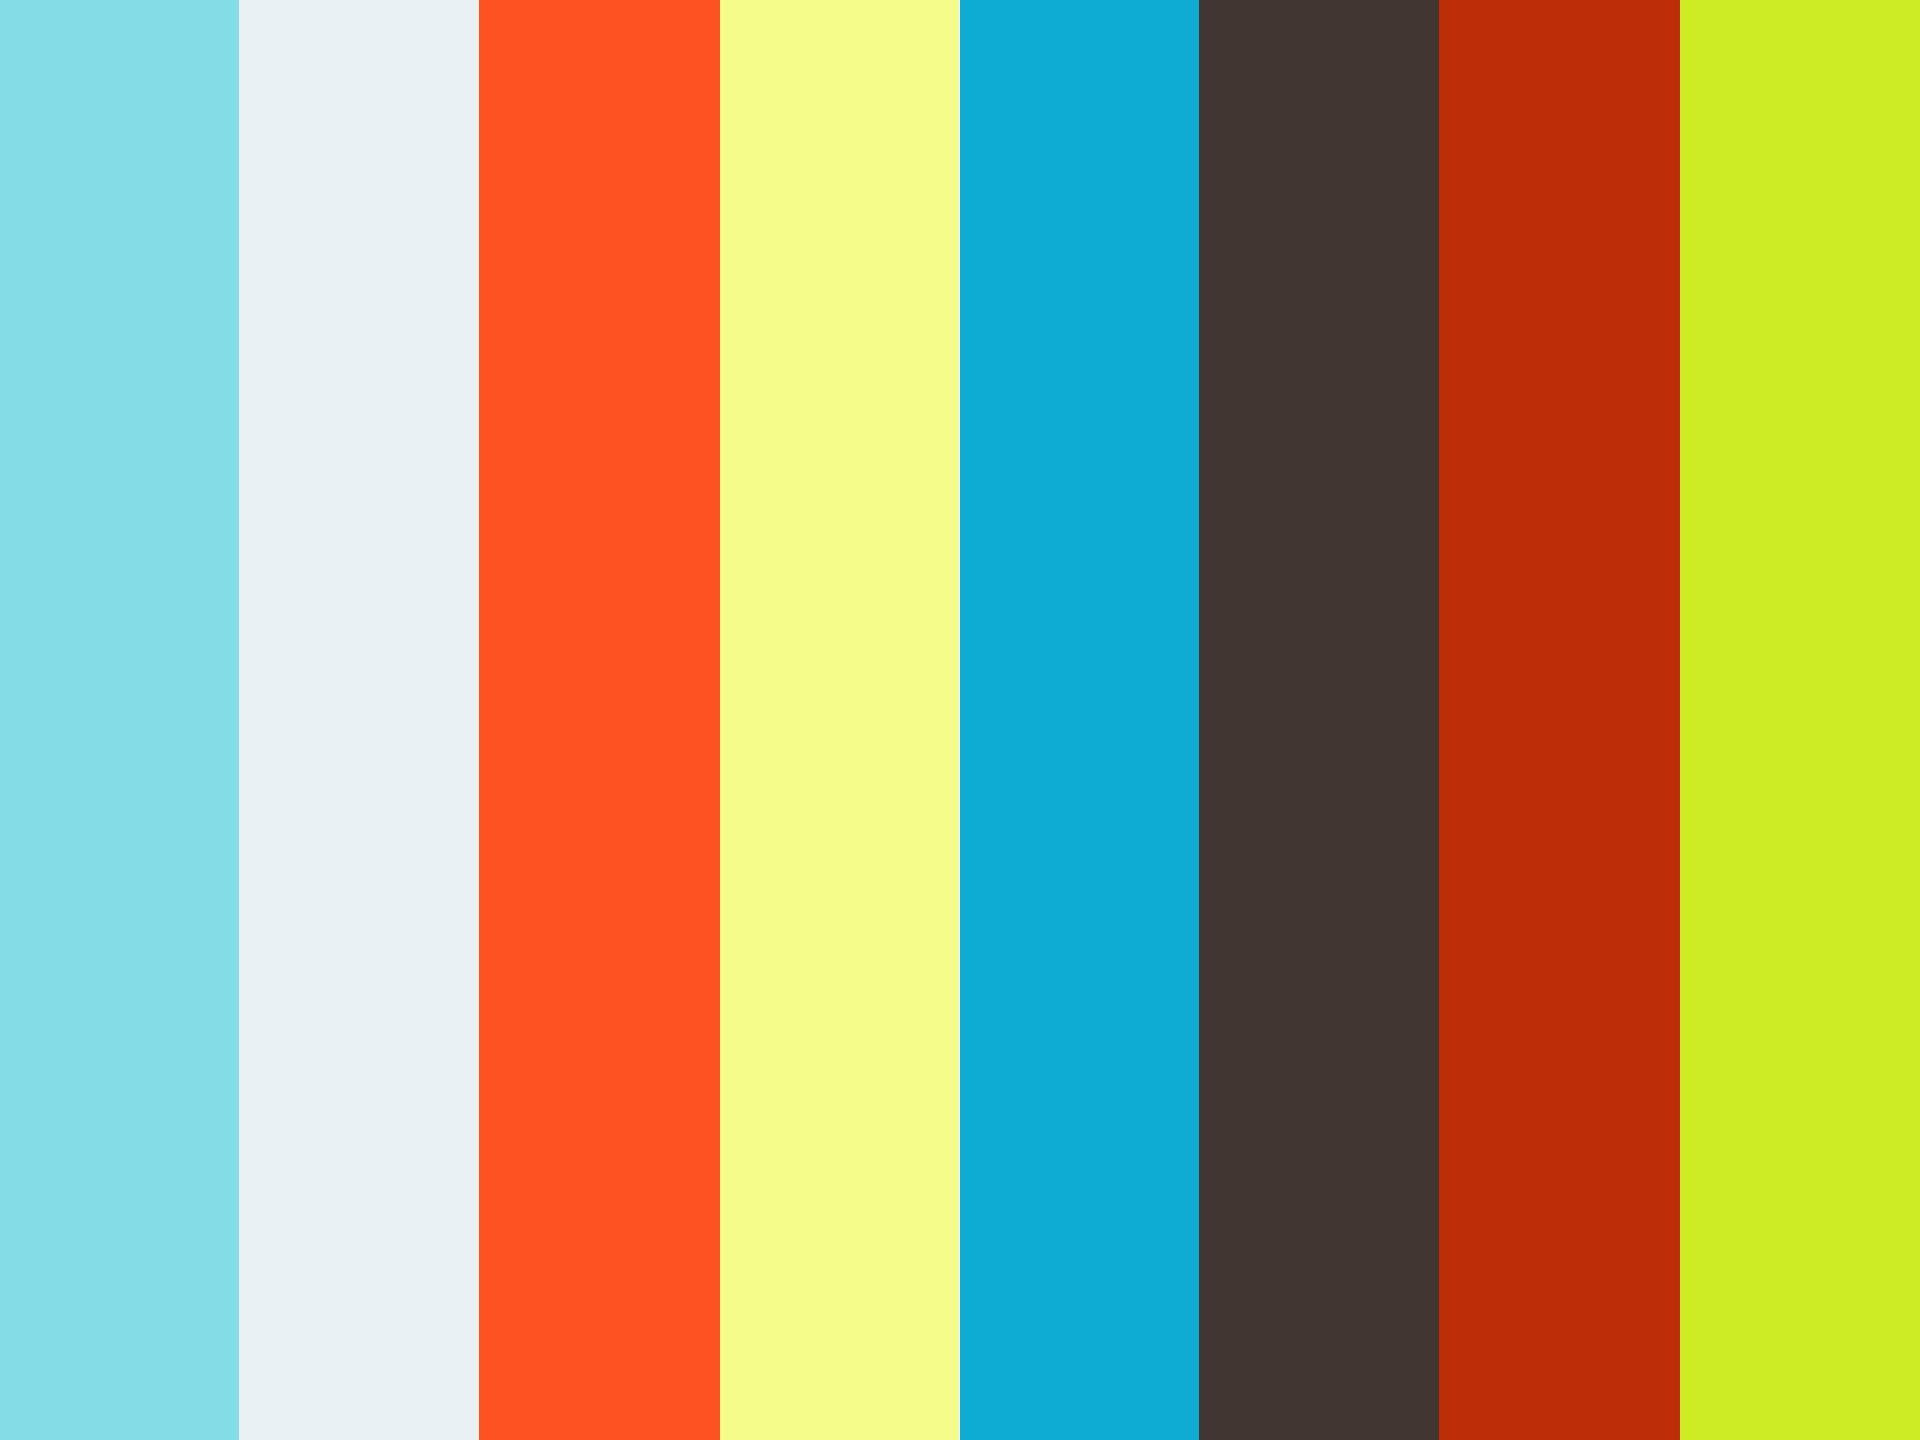 EF Line. 導入セミナー「咬合と機能不全におけるトレーナーの応用」 #3 診断の重要性